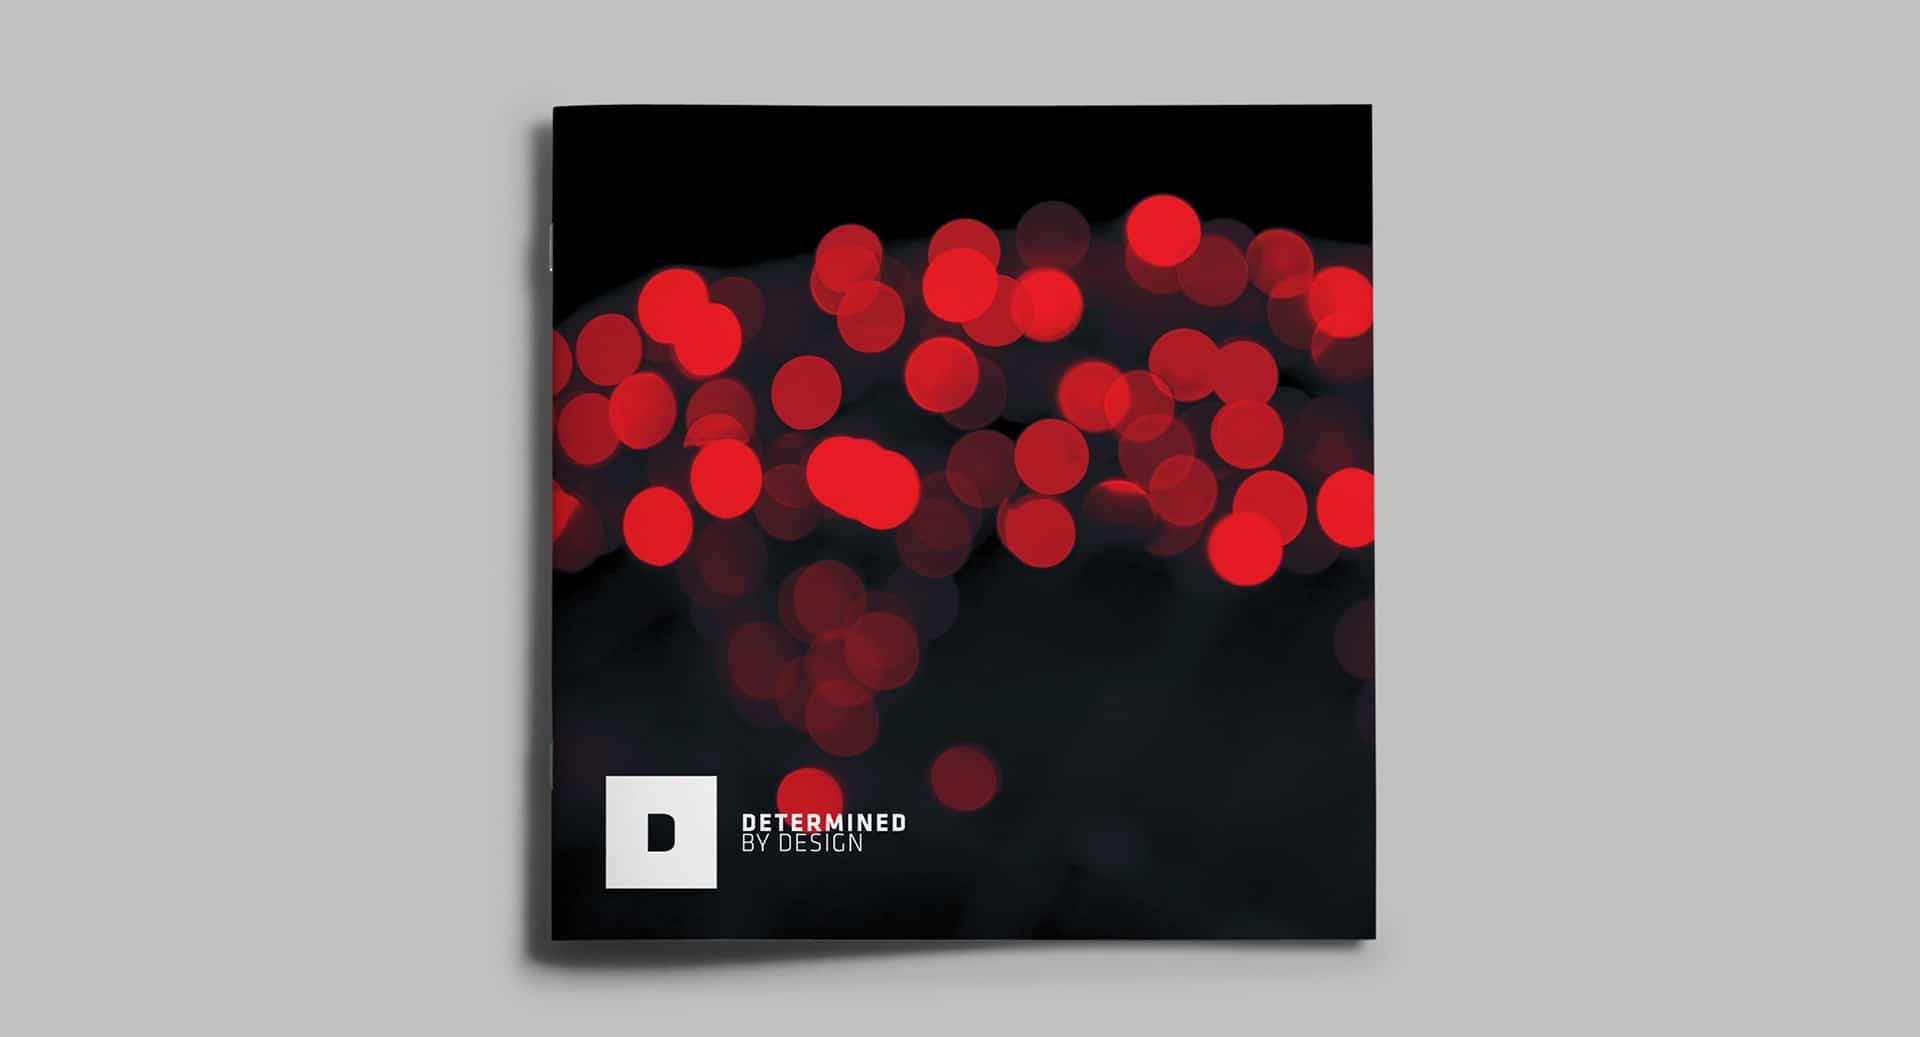 dbd-booklet-halfwidth